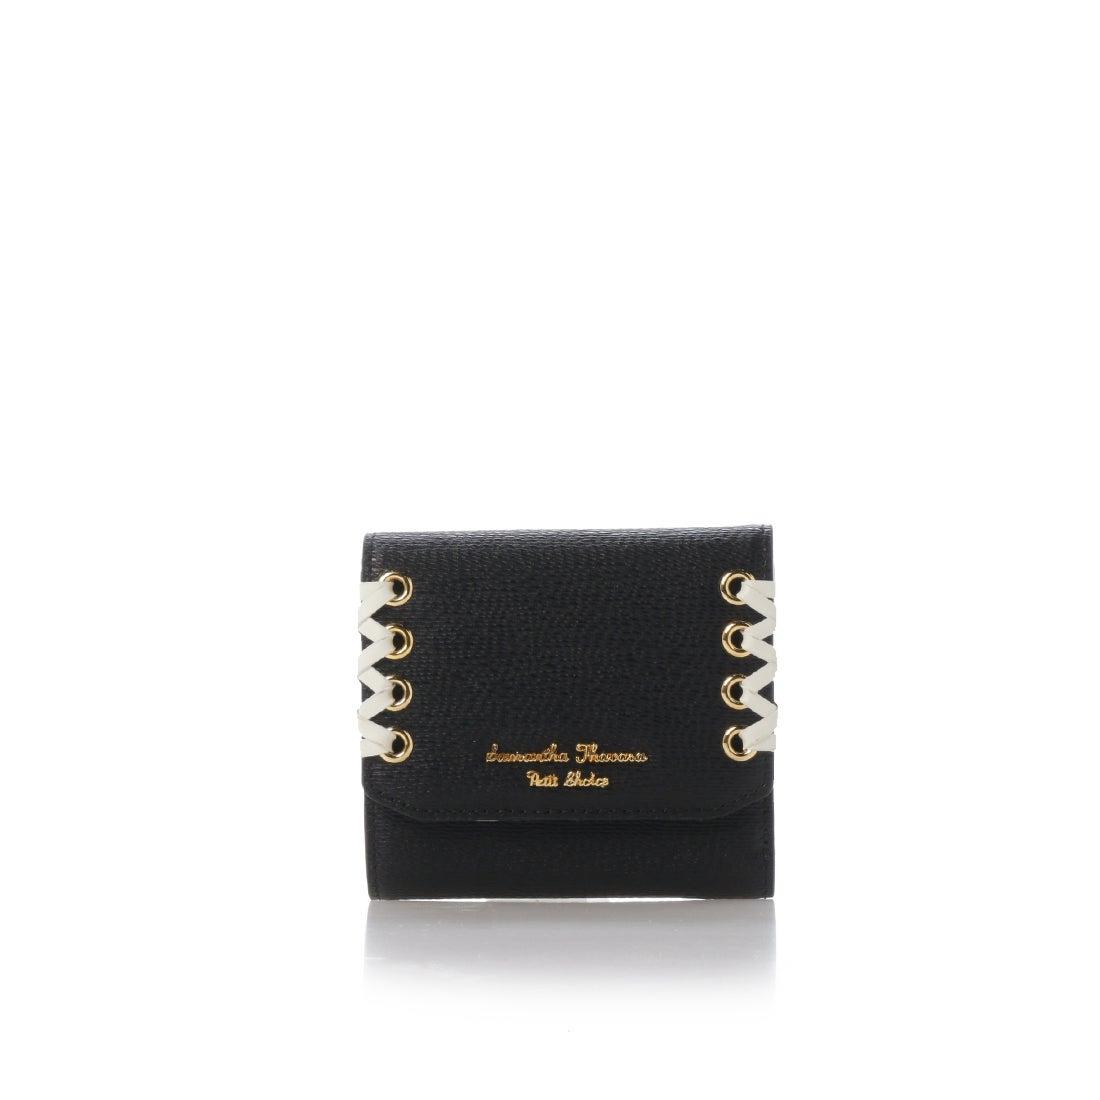 b638da1bd9b9 Samantha Thavasa サマンサタバサプチチョイス かがりリボンシリーズ(折財布) ブラック -サマンサタバサオンラインショップ by  ロコンド